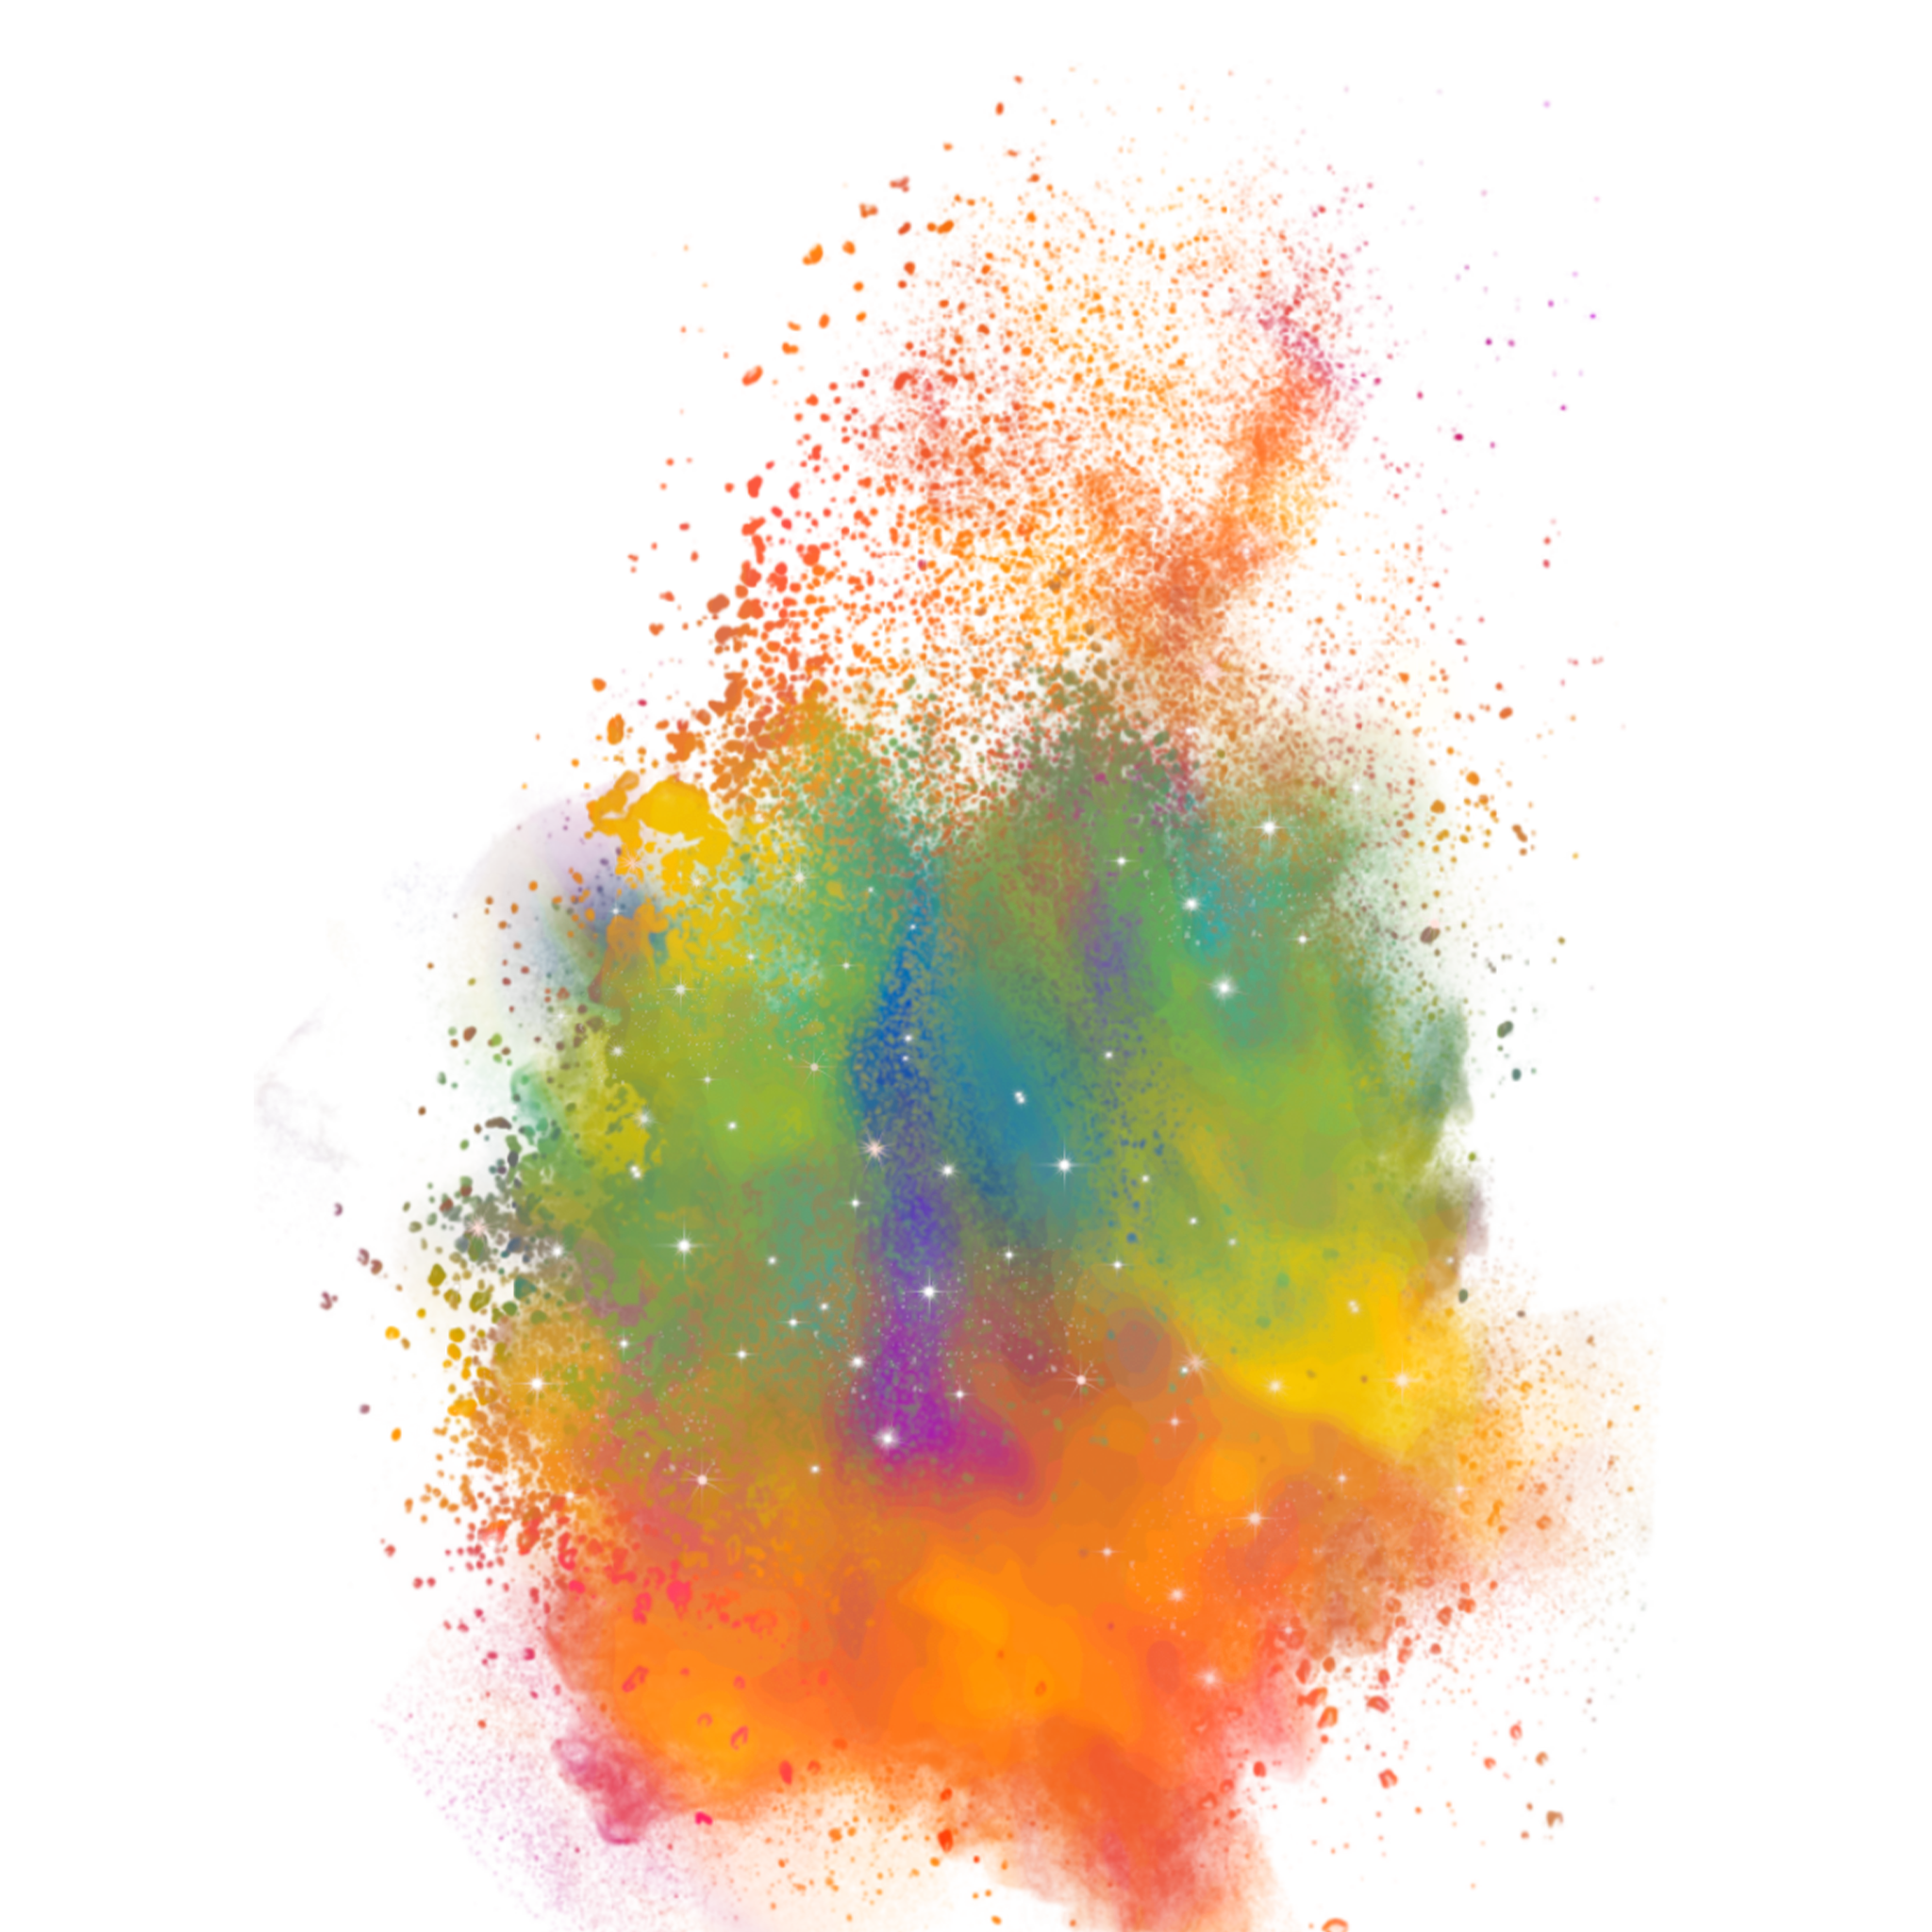 Color Dust Explosion Png.